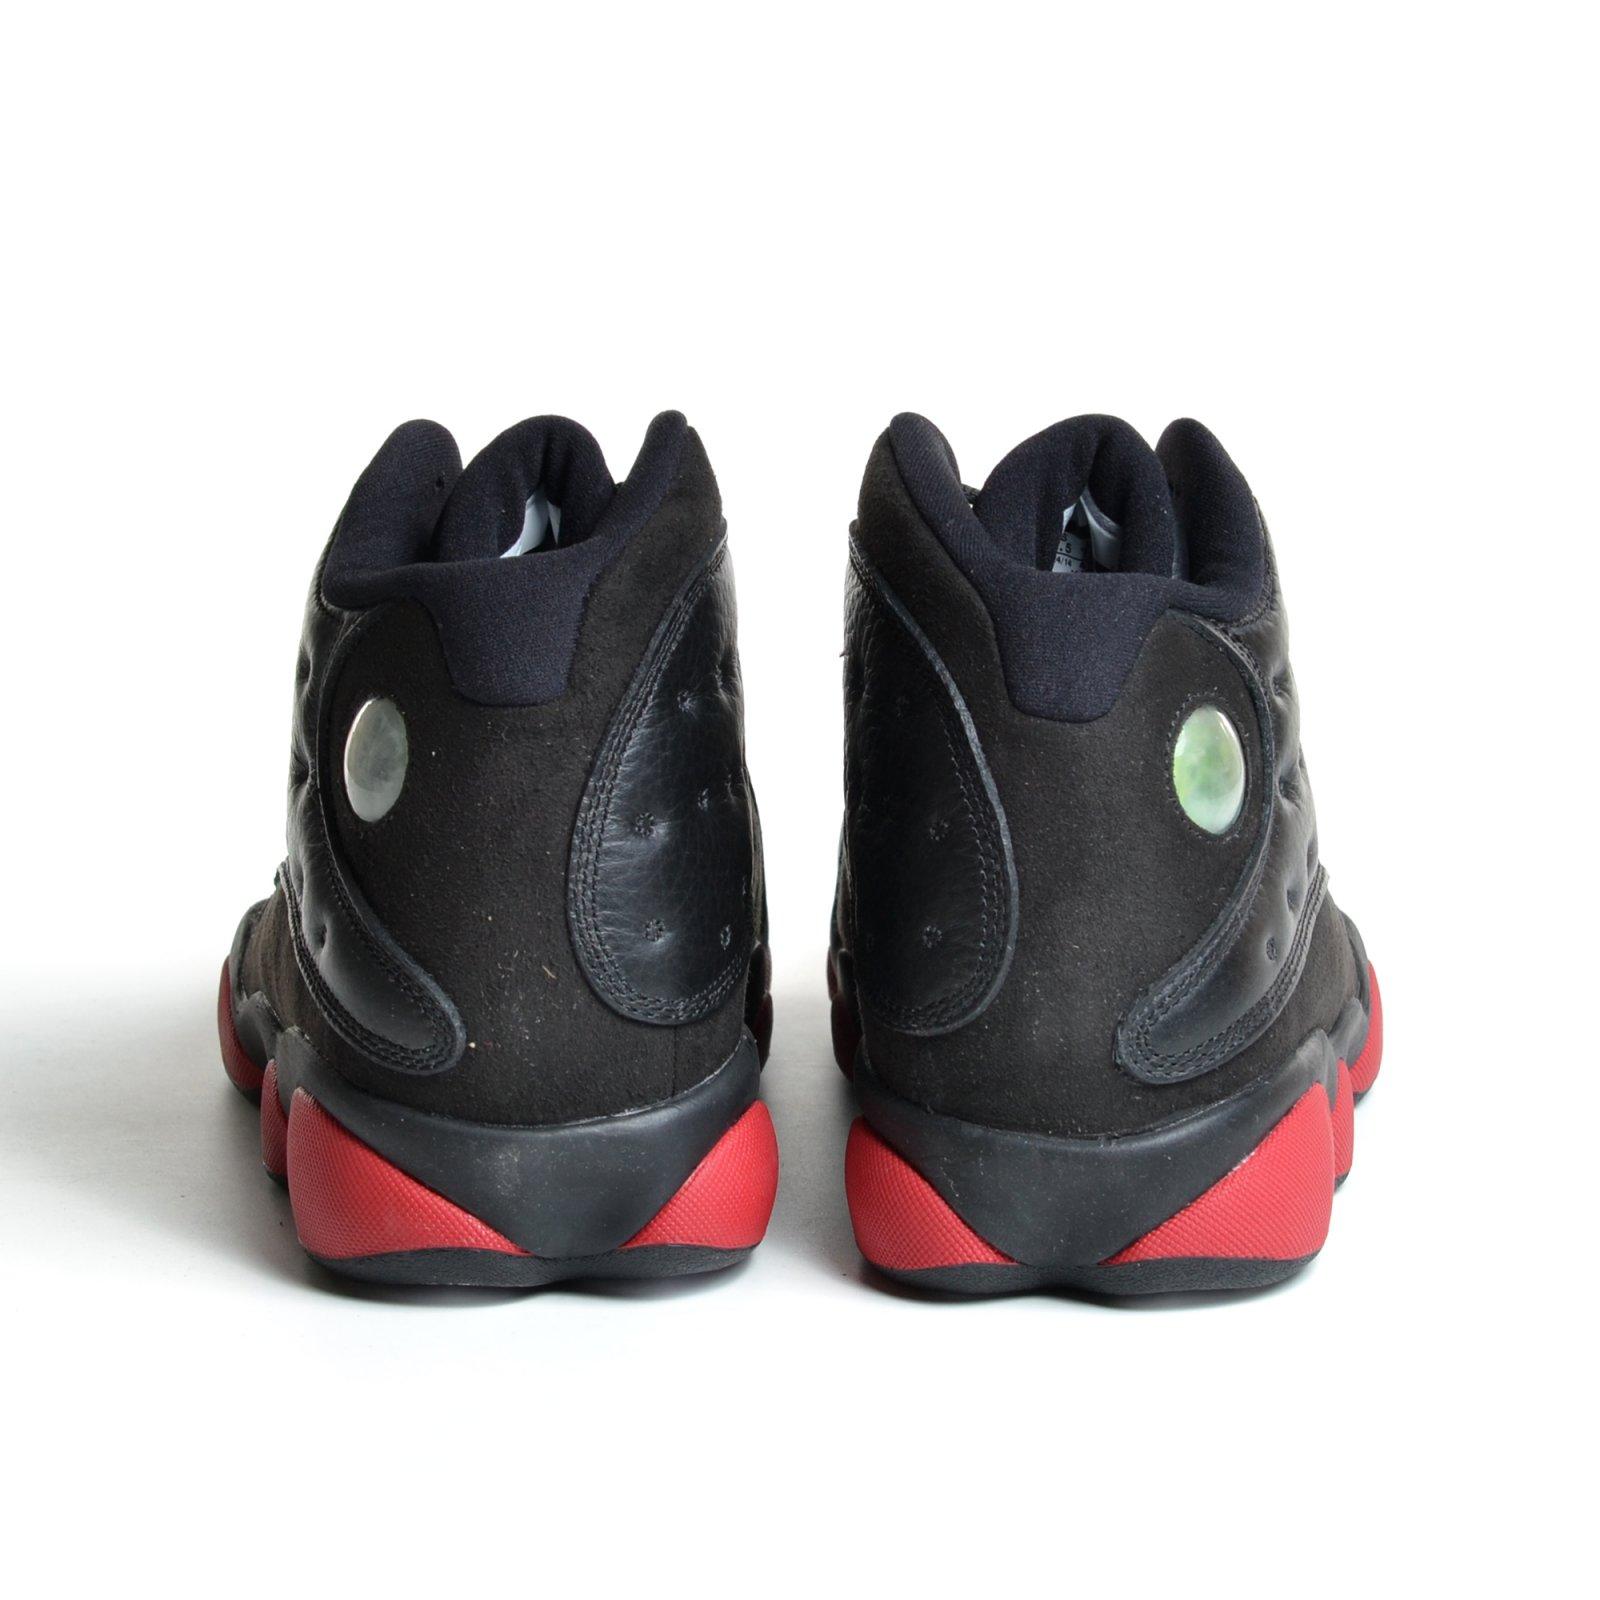 AIR JORDAN 13 RETRO DIRTY BRED 2014 BLACK GYM RED XIII MENu0026#39;S DS NIKE 414571-003 | EBay